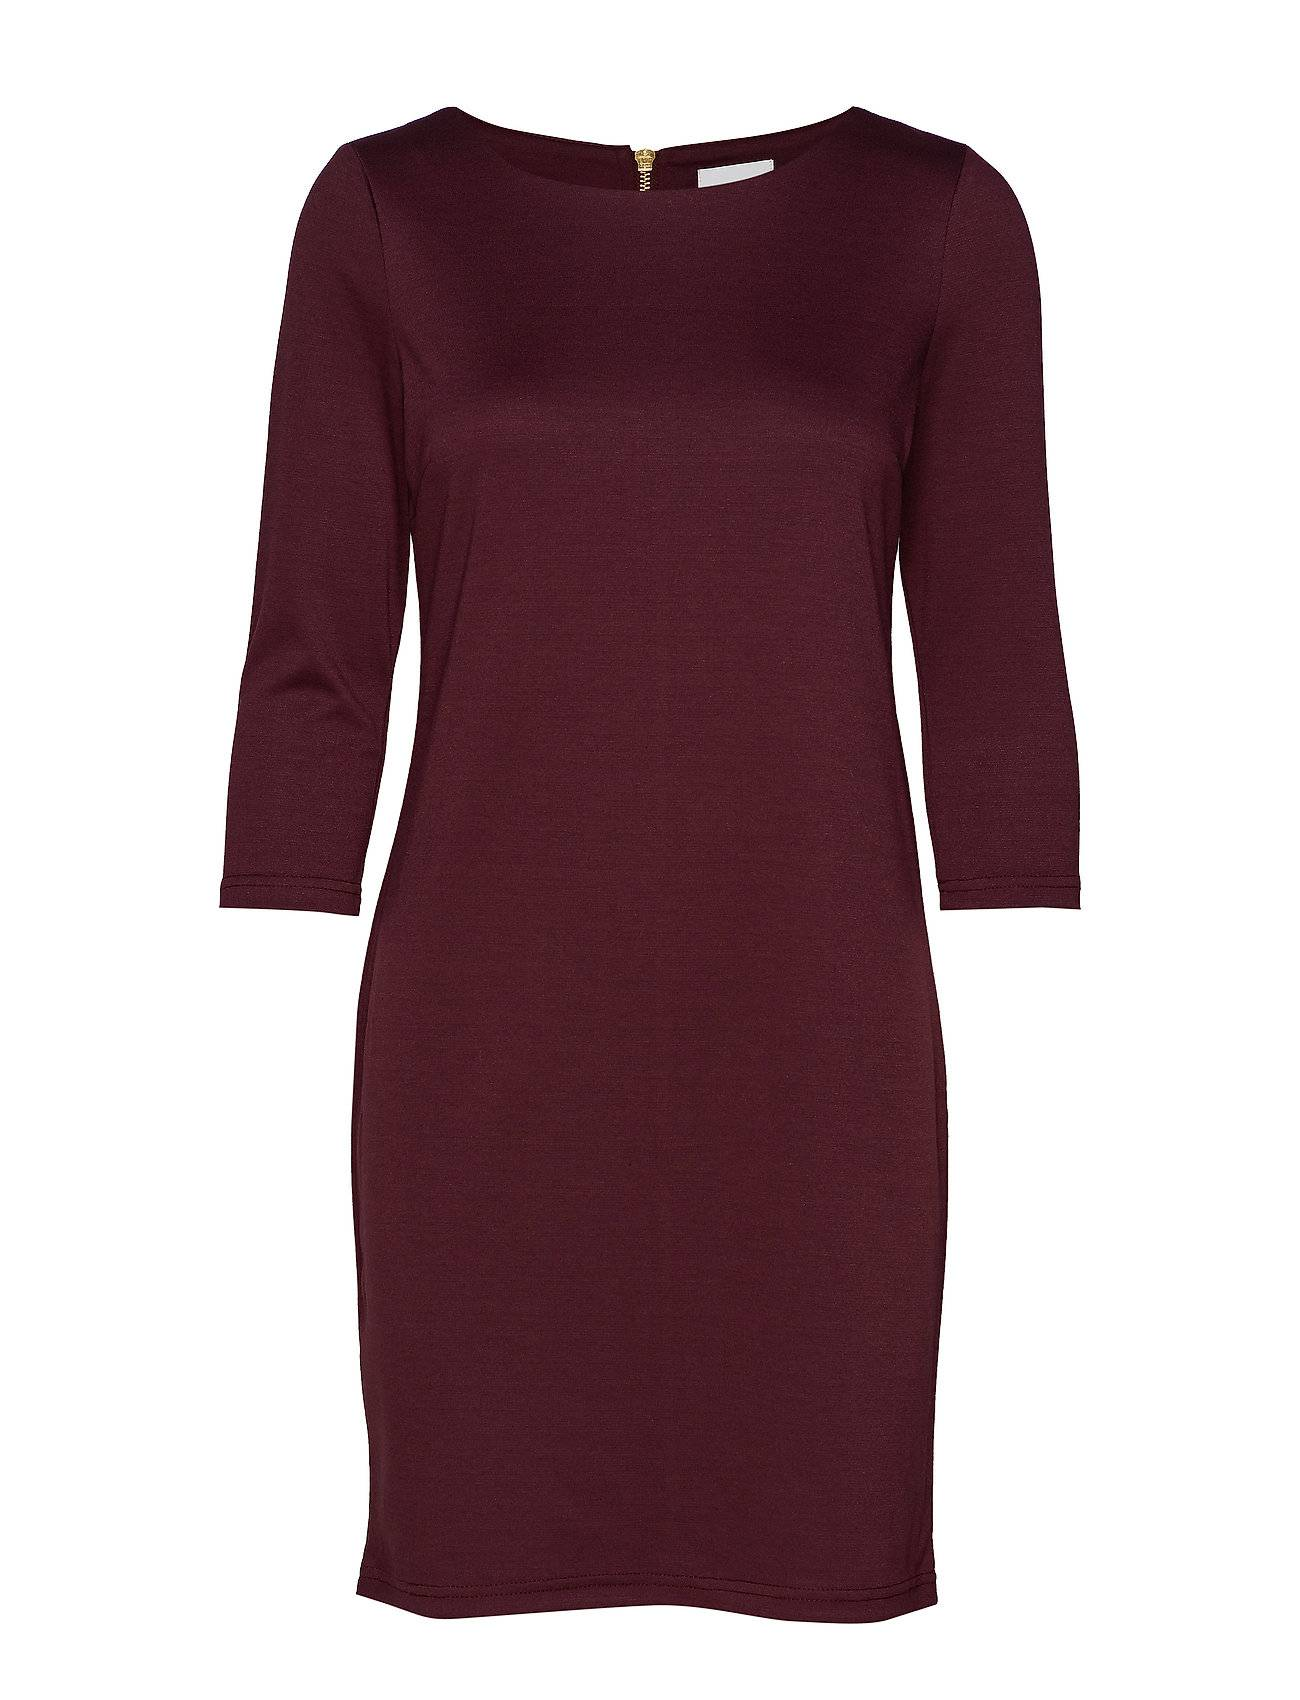 Image of VILA Vitinny New Dress-Noos Mekko Liila VILA